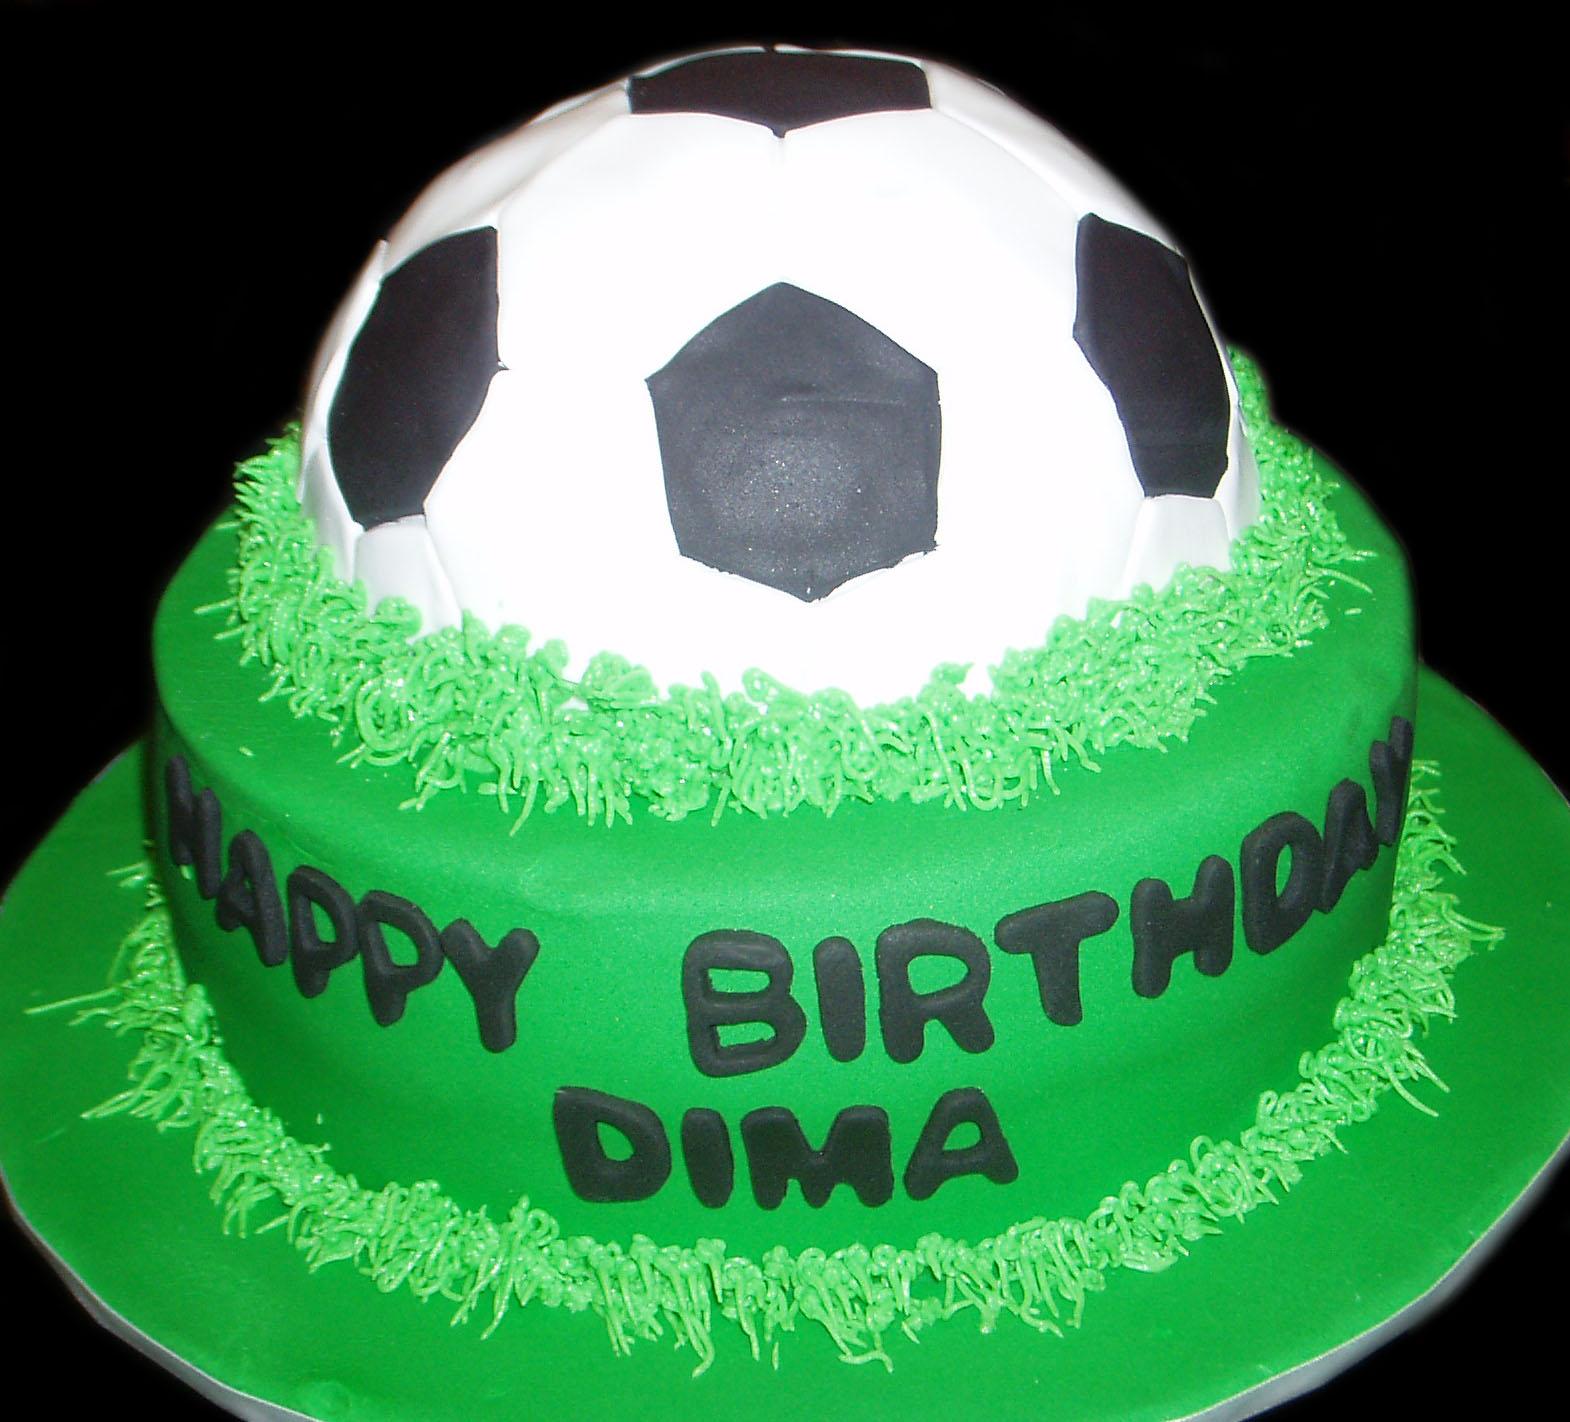 Nada s cakes: Soccer Birthday Cake - by Nada s Cakes Canberra